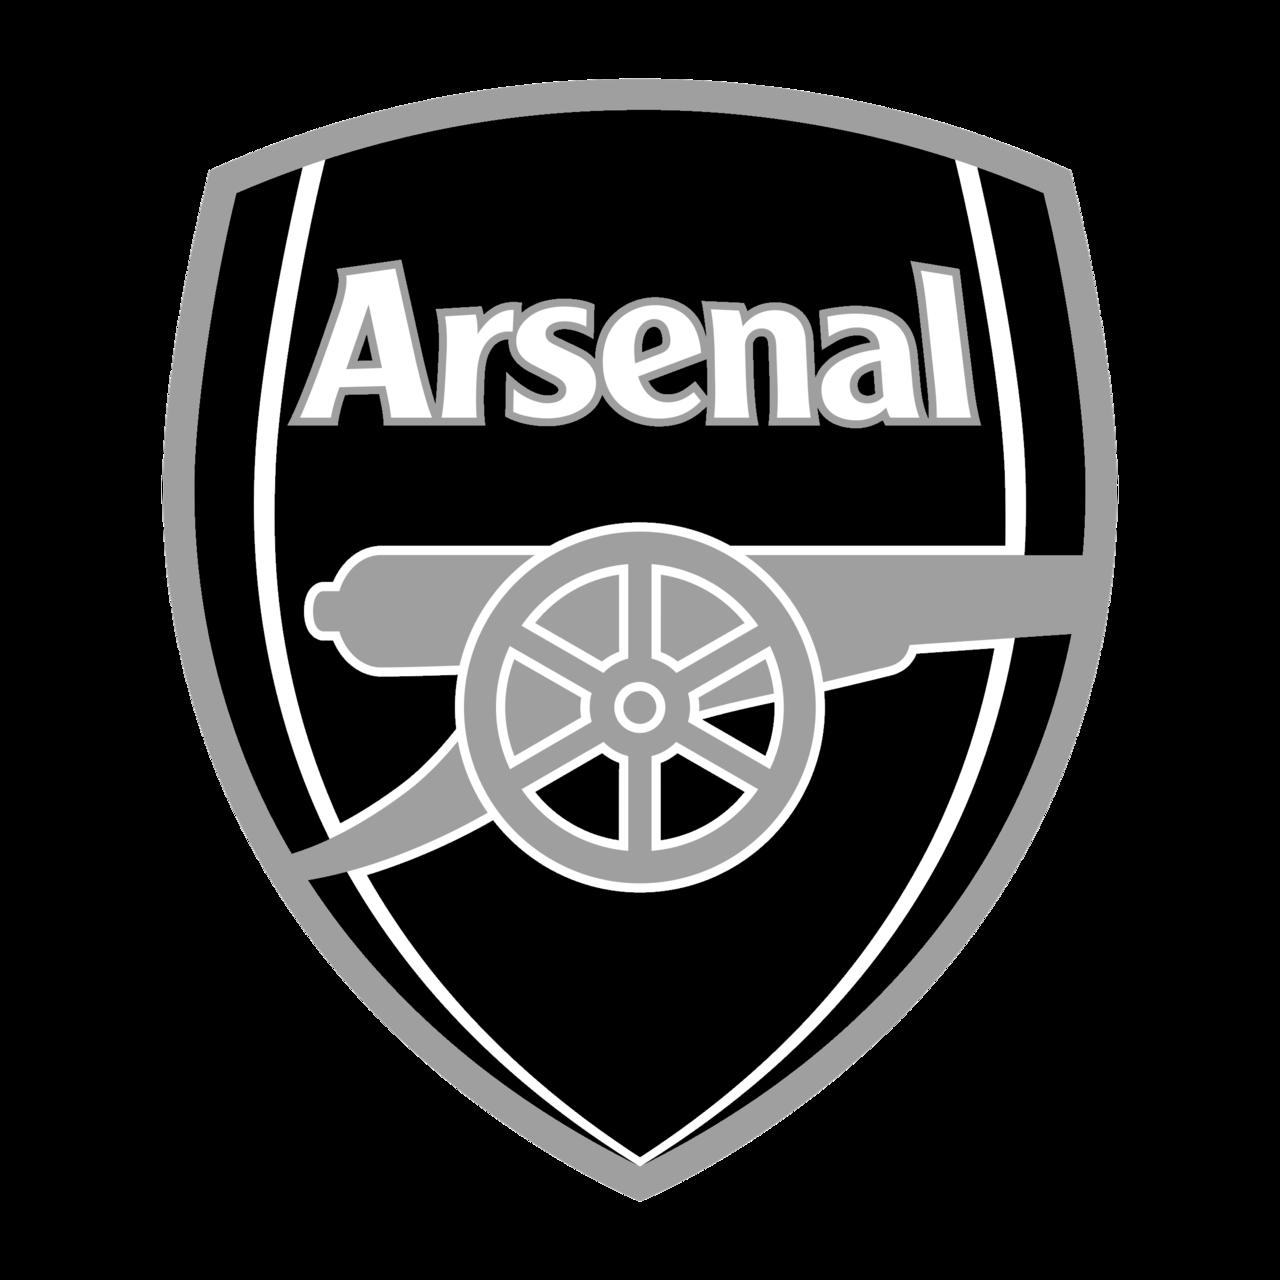 arsenal-logo-black-and-white-1